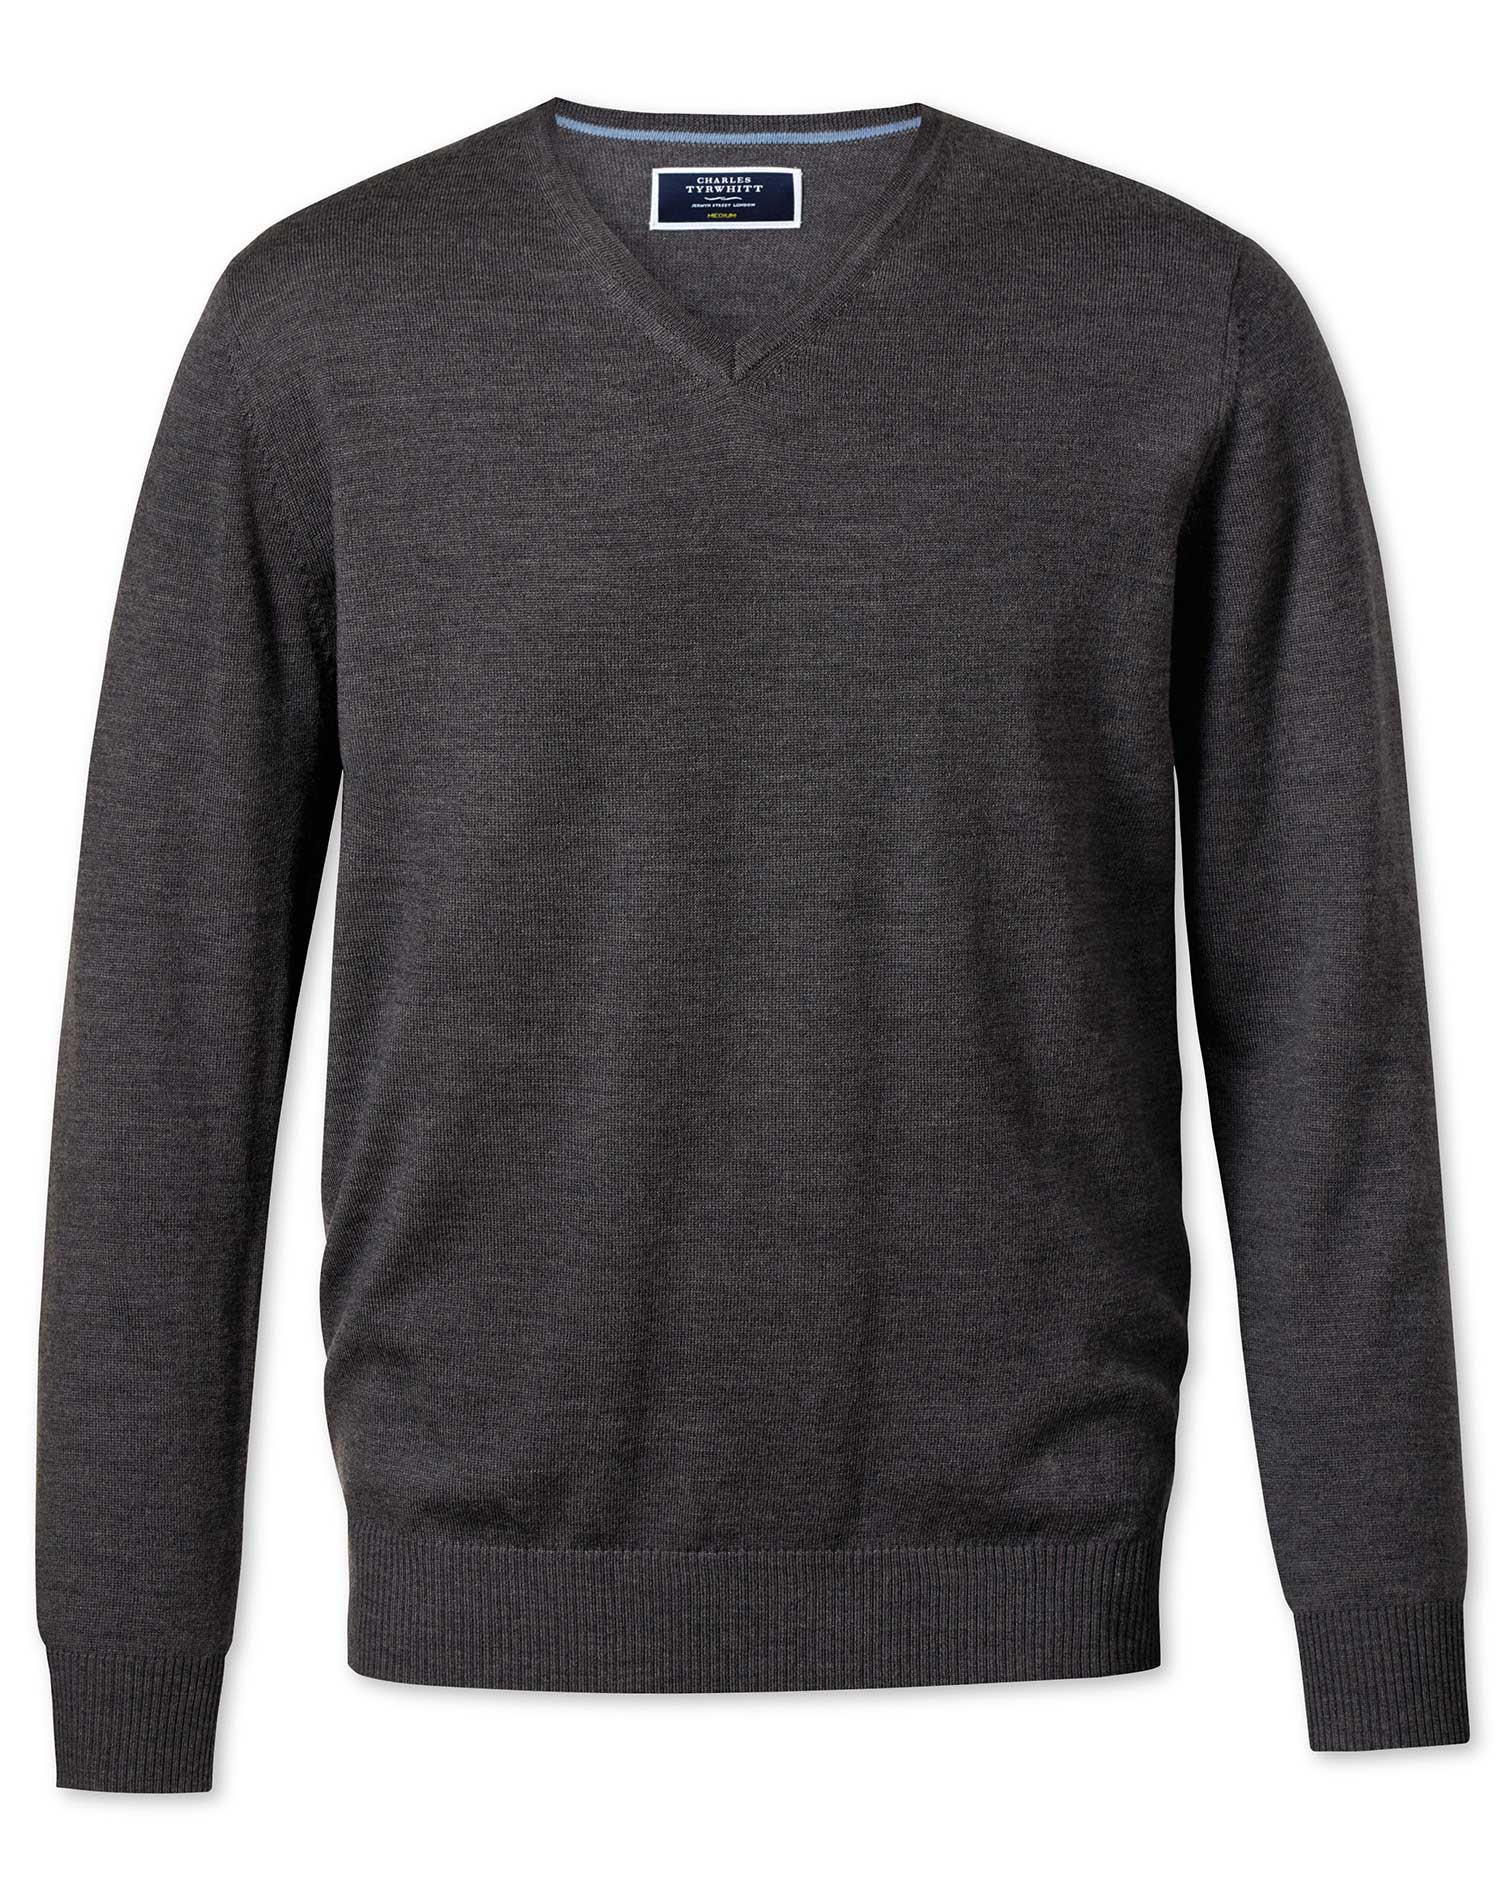 Charcoal Merino Wool V-Neck Jumper Size Large by Charles Tyrwhitt